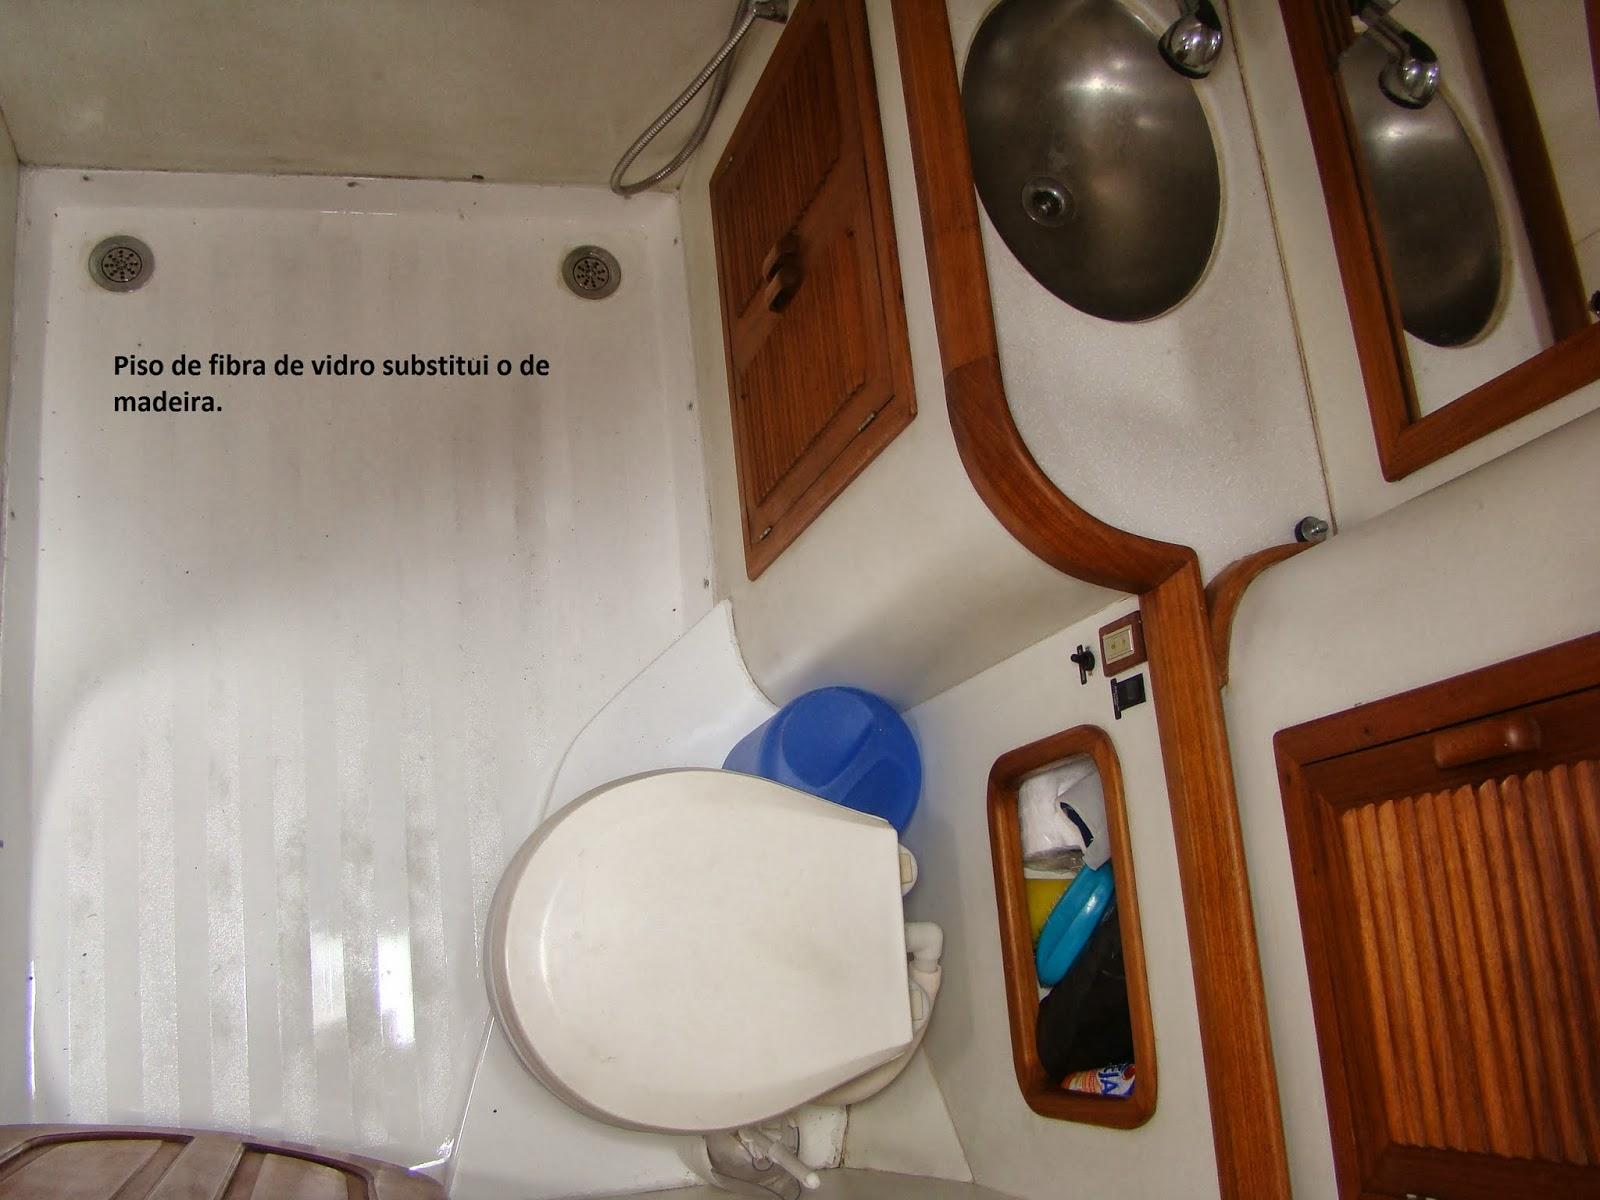 Veleiro Entre Pólos Setembro 2013 -> Como Limpar Pia De Banheiro De Fibra